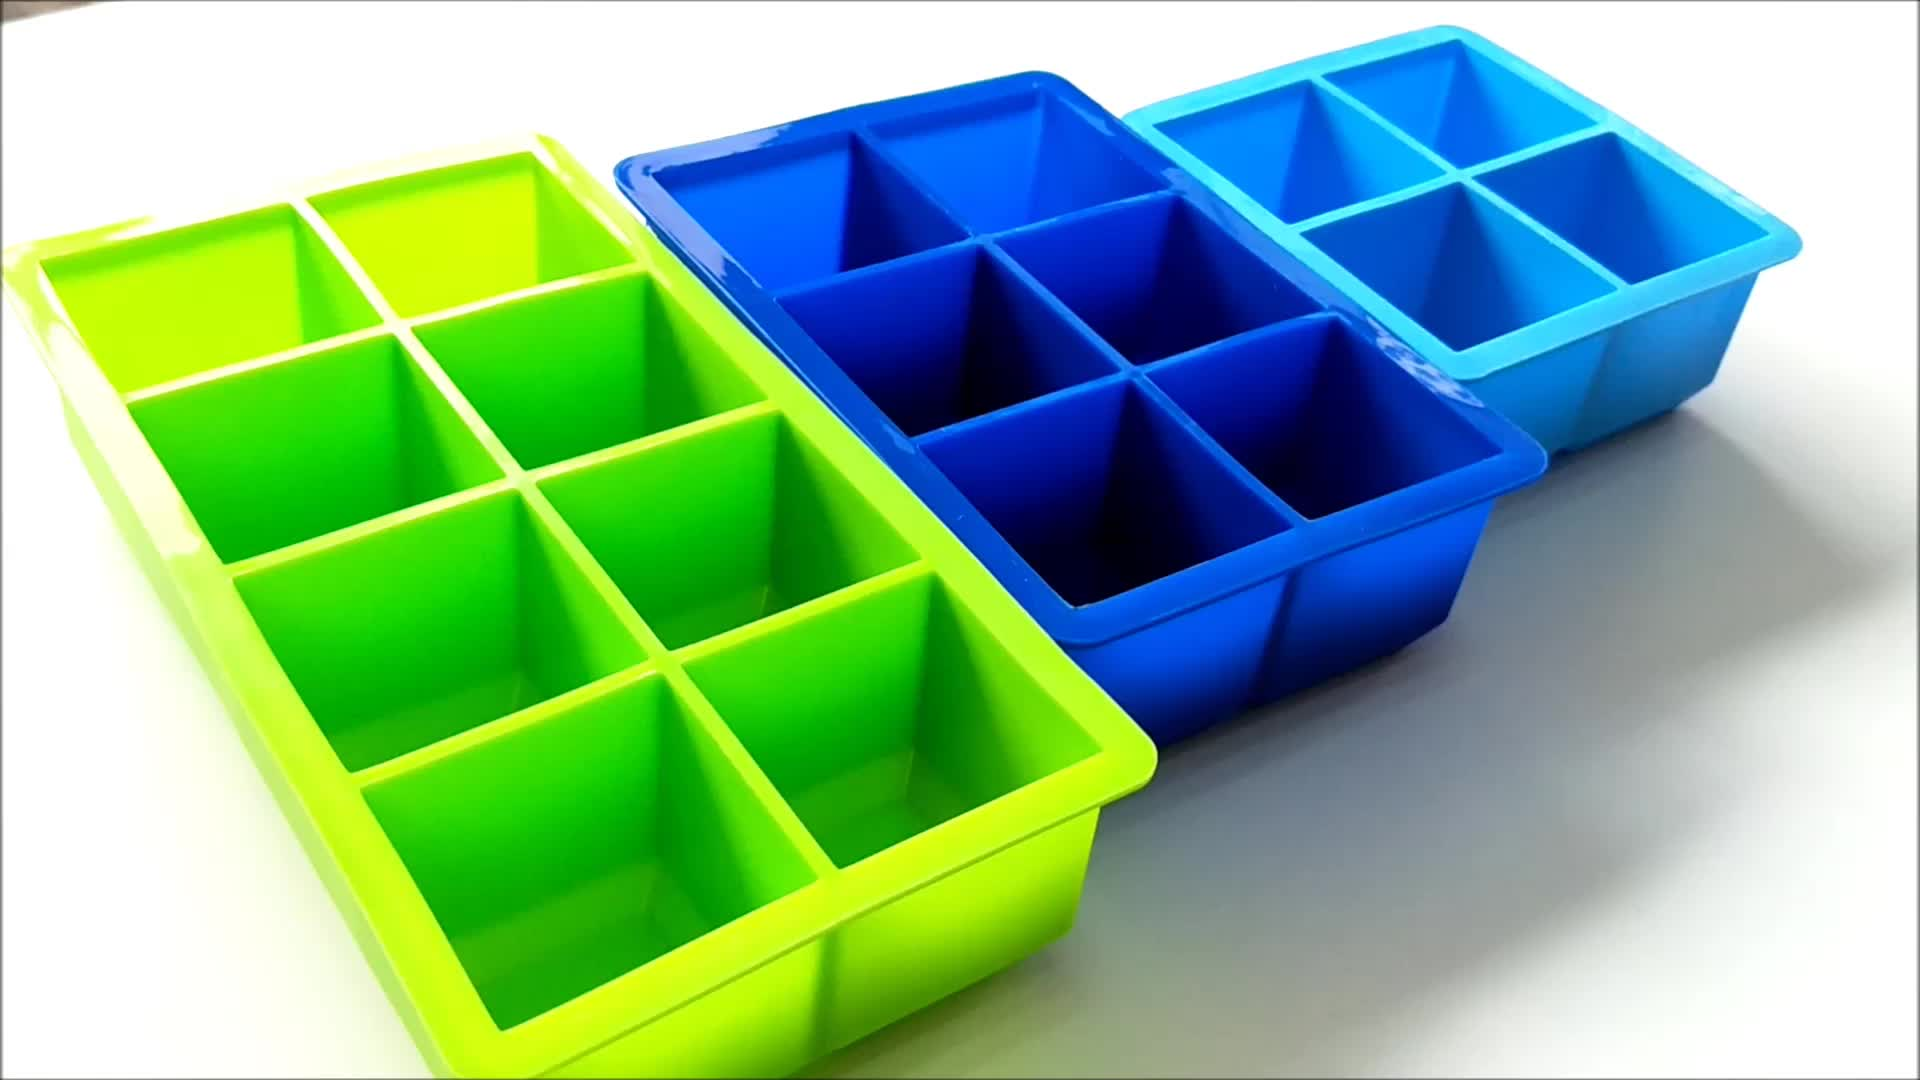 Facile À Utiliser 4 6 8 cavité Platine Personnalisé bac à glaçons, bac à glaçons Personnalisé en silicone